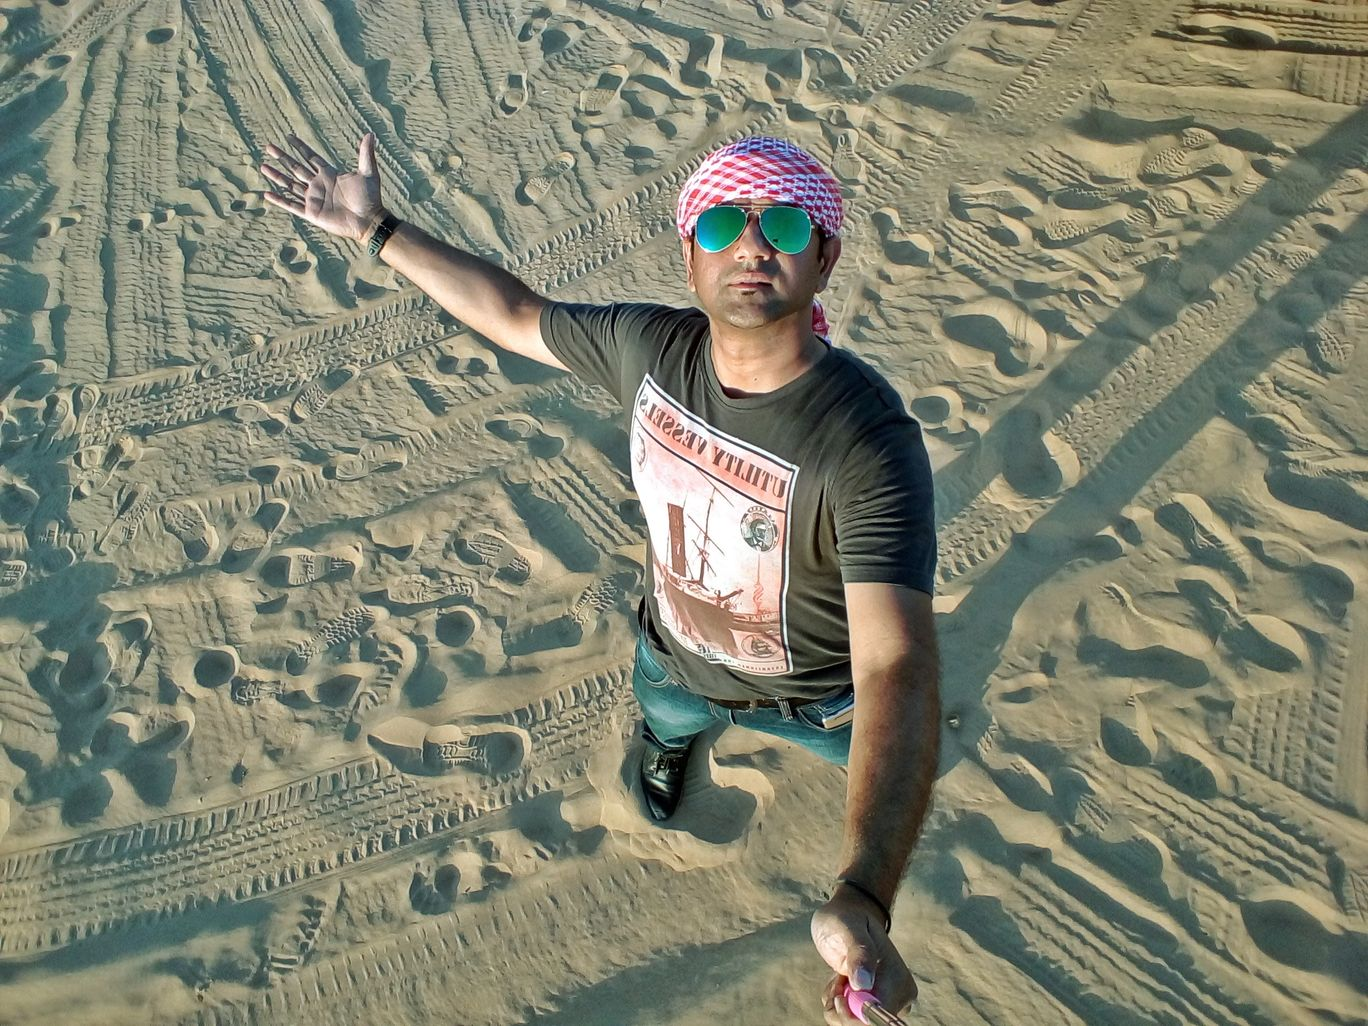 Photo of Desert Safari Dubai - Dubai - United Arab Emirates By Prady Das (InstaPrady)